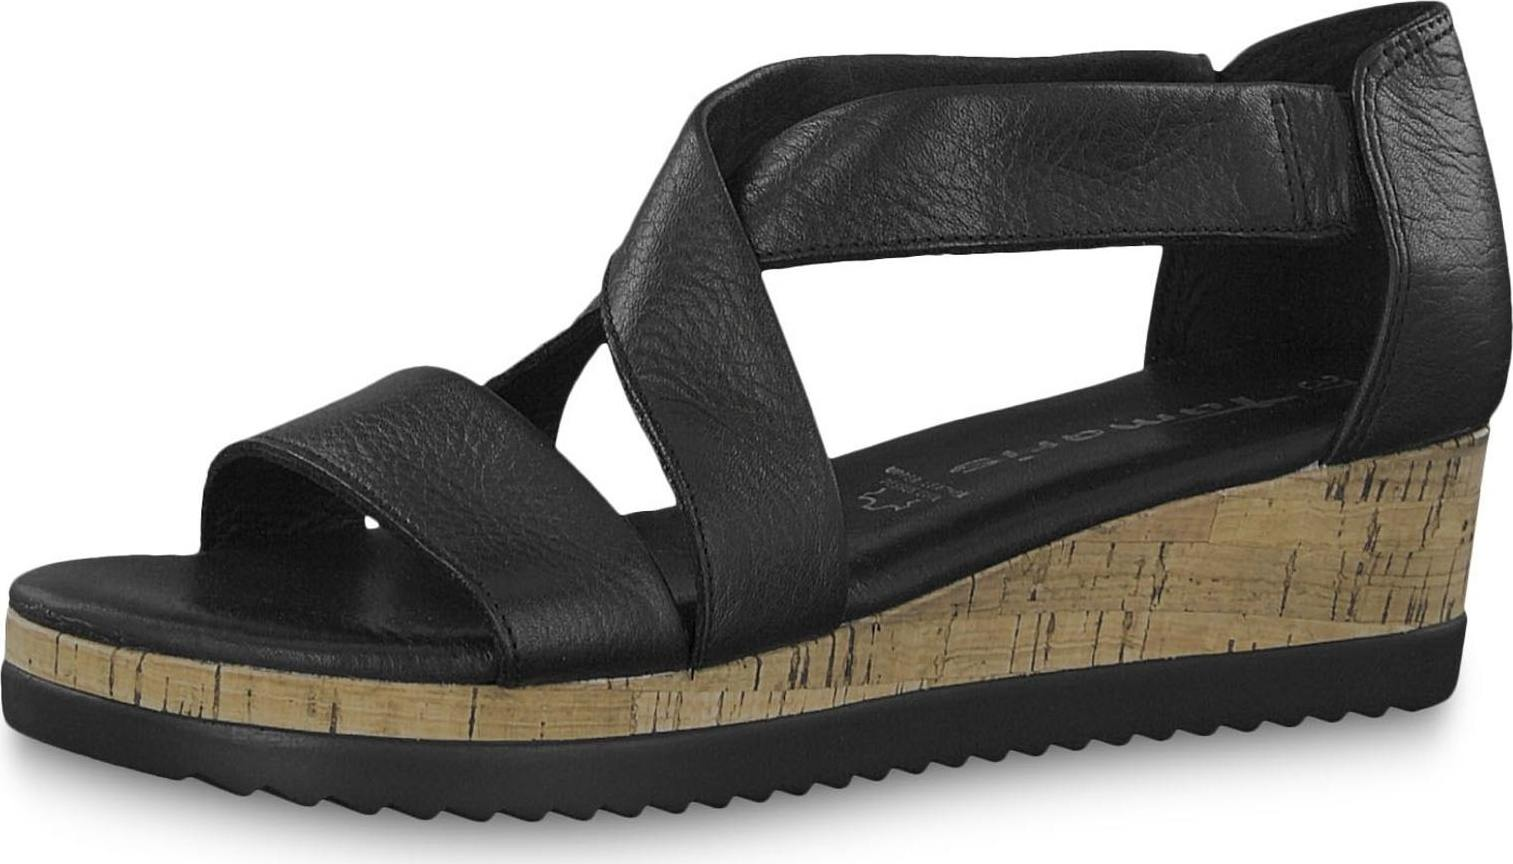 bb6753c640 Dámská obuv TAMARIS 1-1-28224-22 BLACK 001 1-1-28224-22 BLACK 001 ...